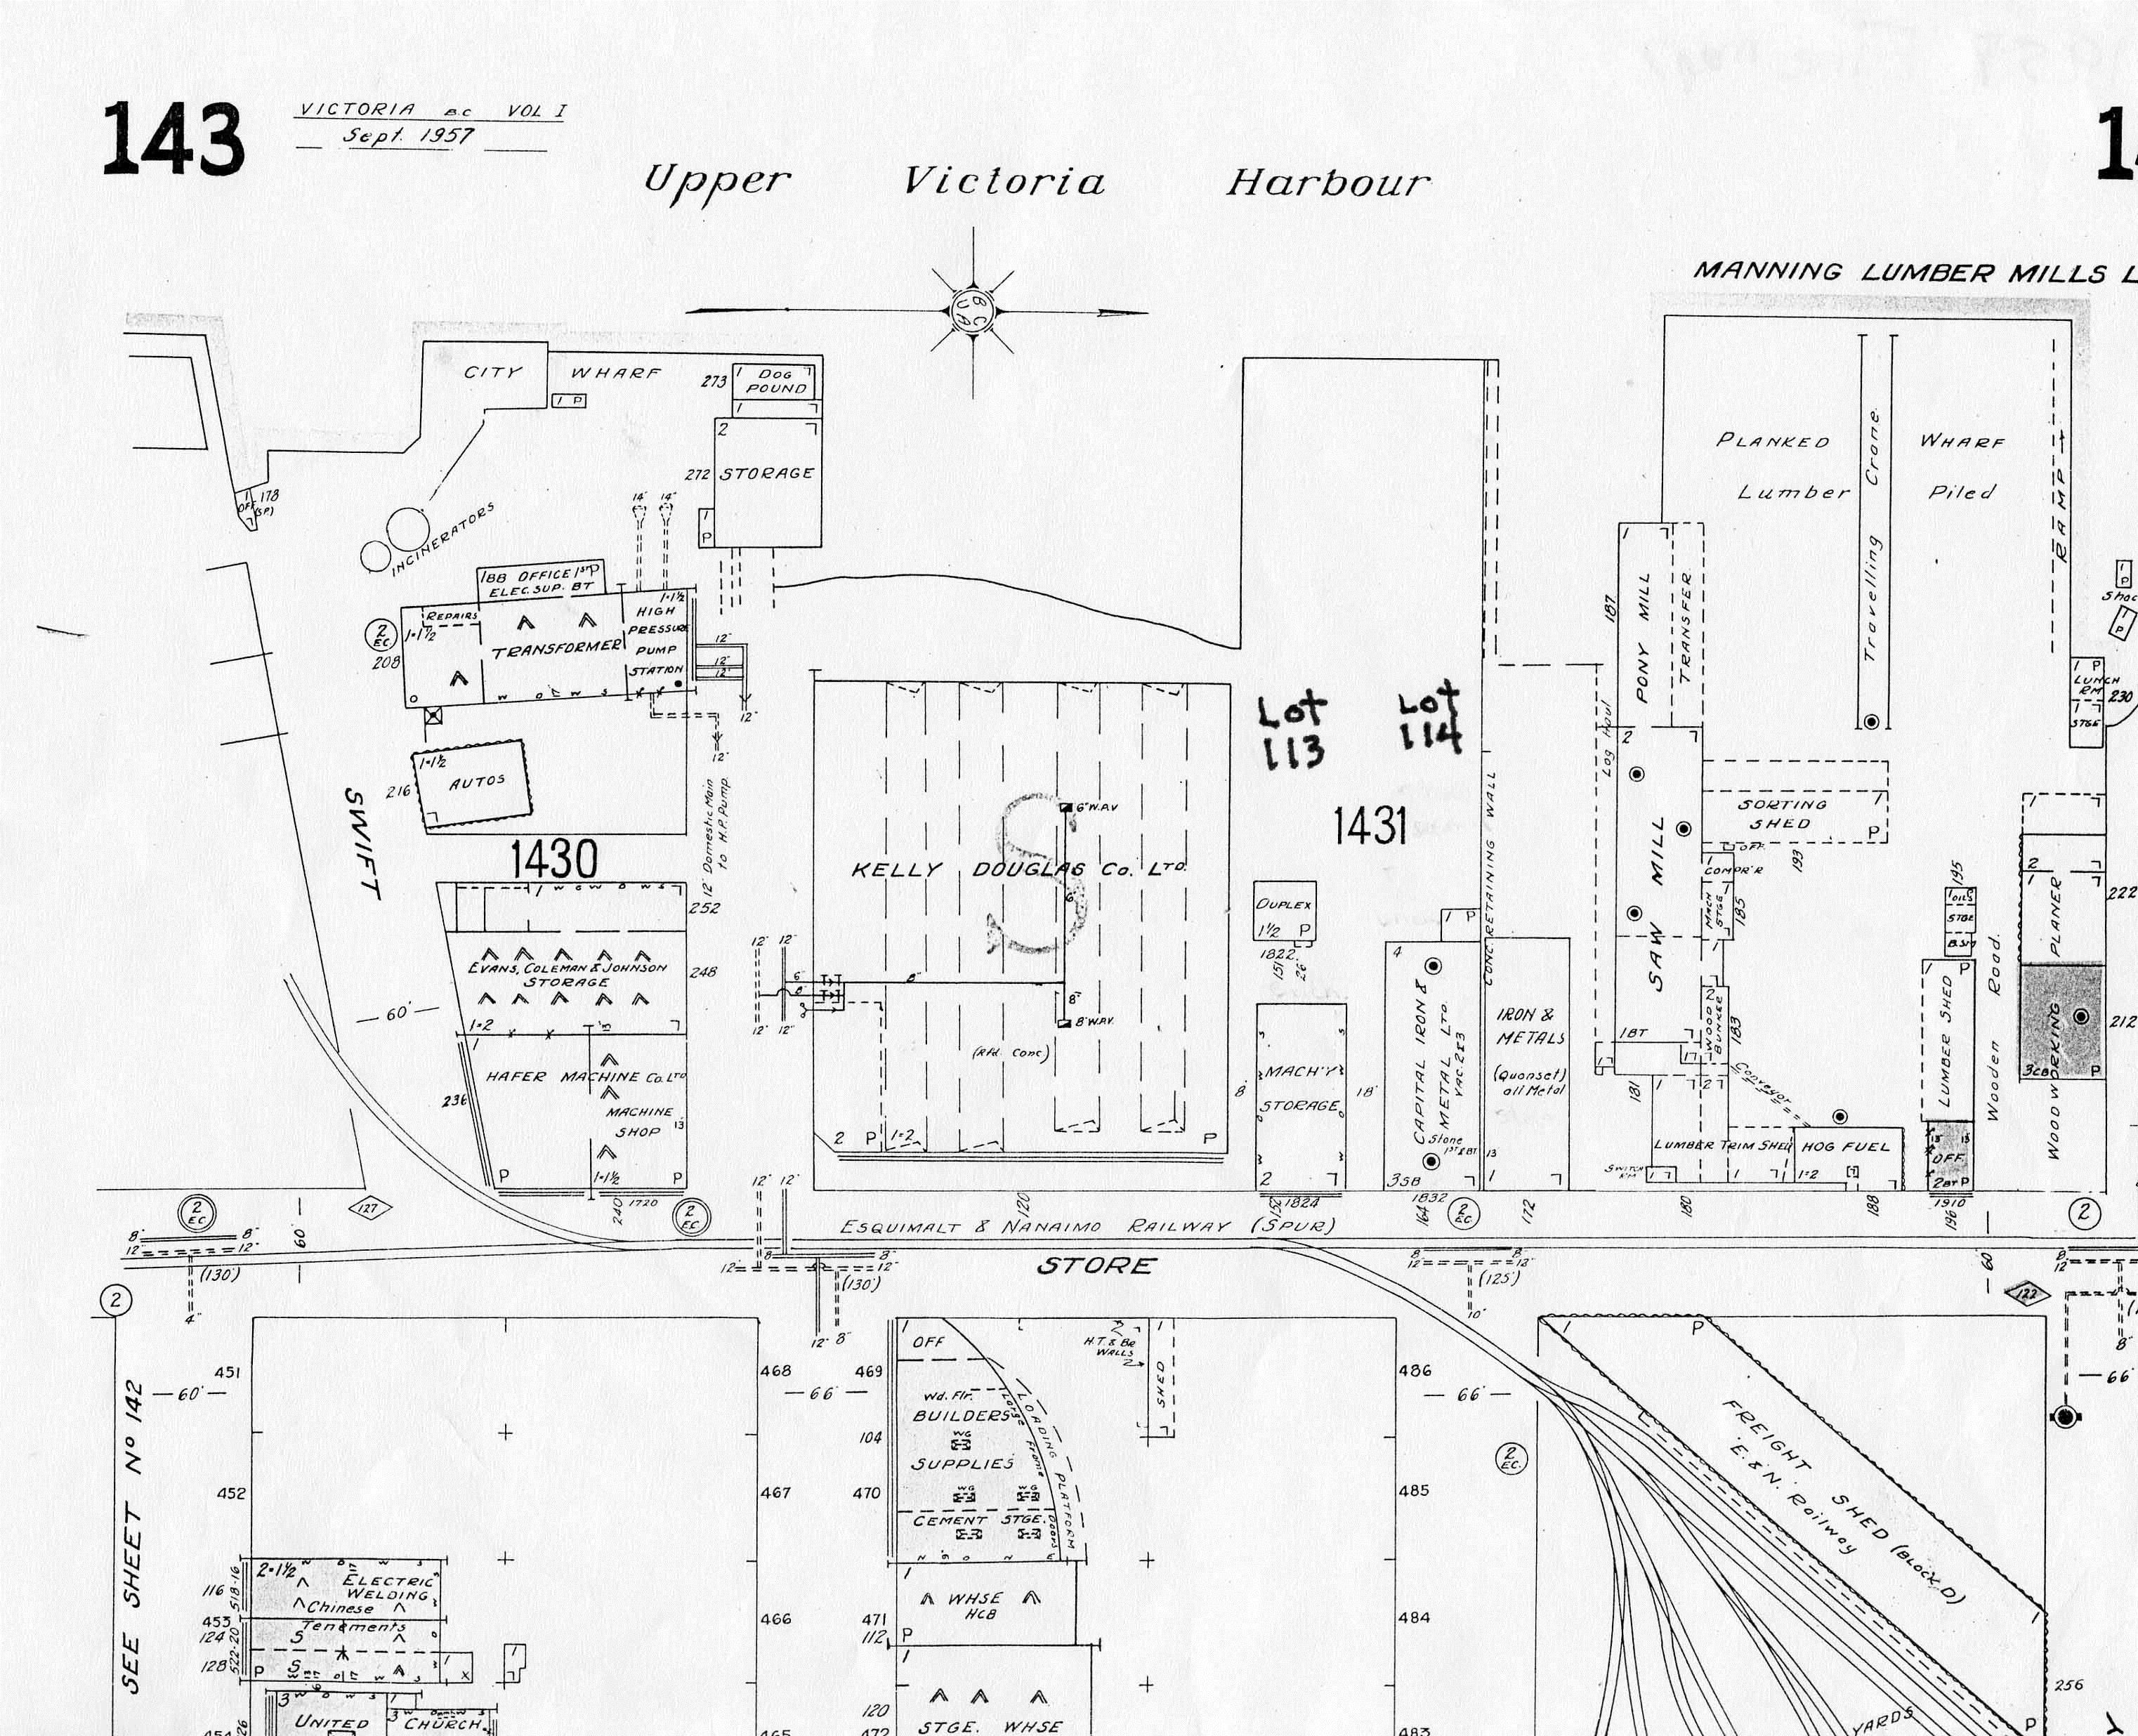 Figure 37 1957 fire map